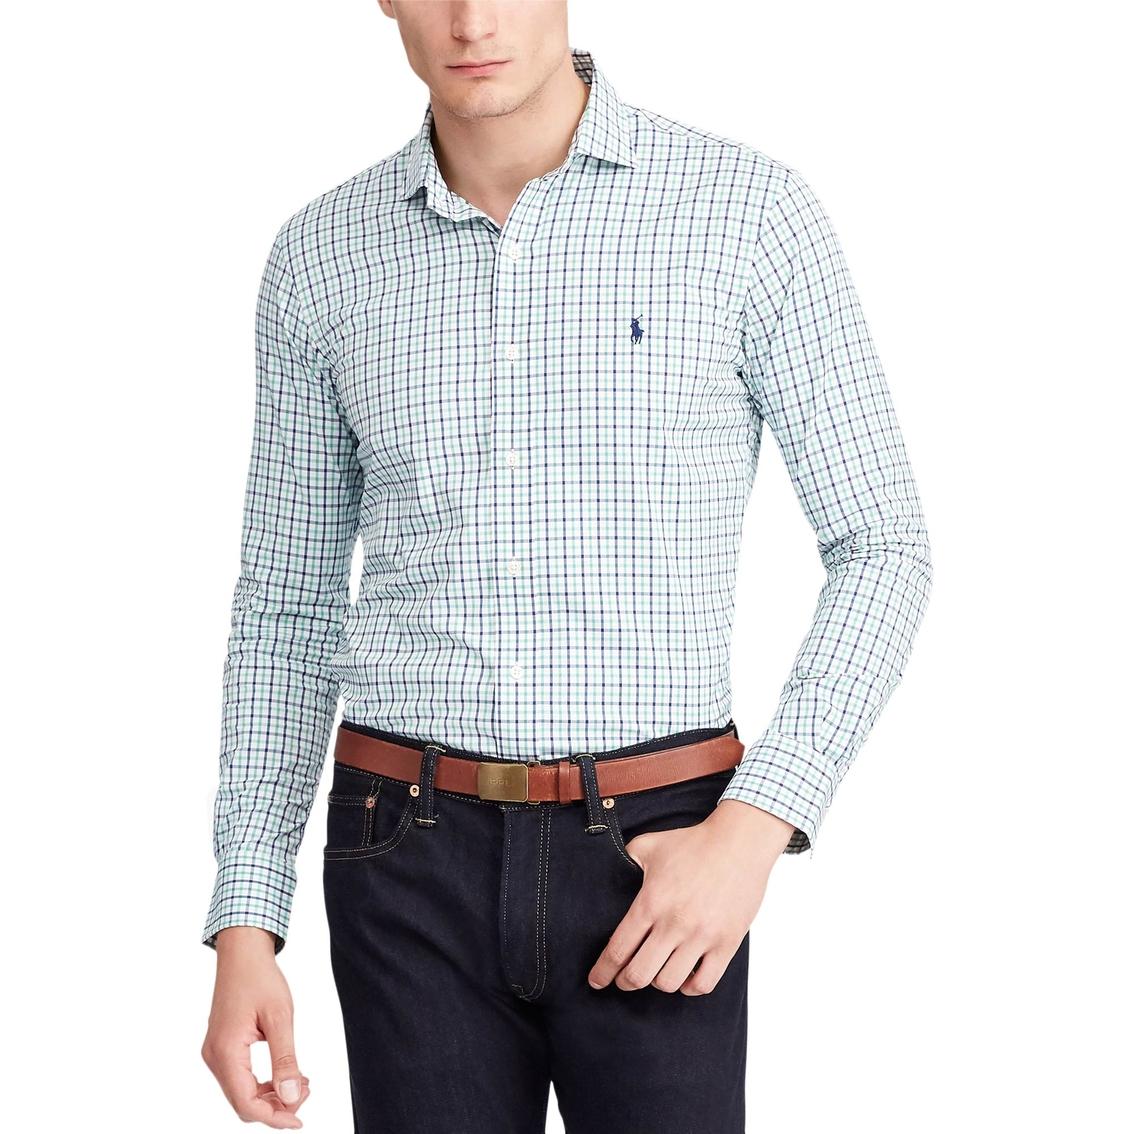 936c2269 Polo Ralph Lauren Classic Fit Plaid Performance Twill Shirt | Casual ...